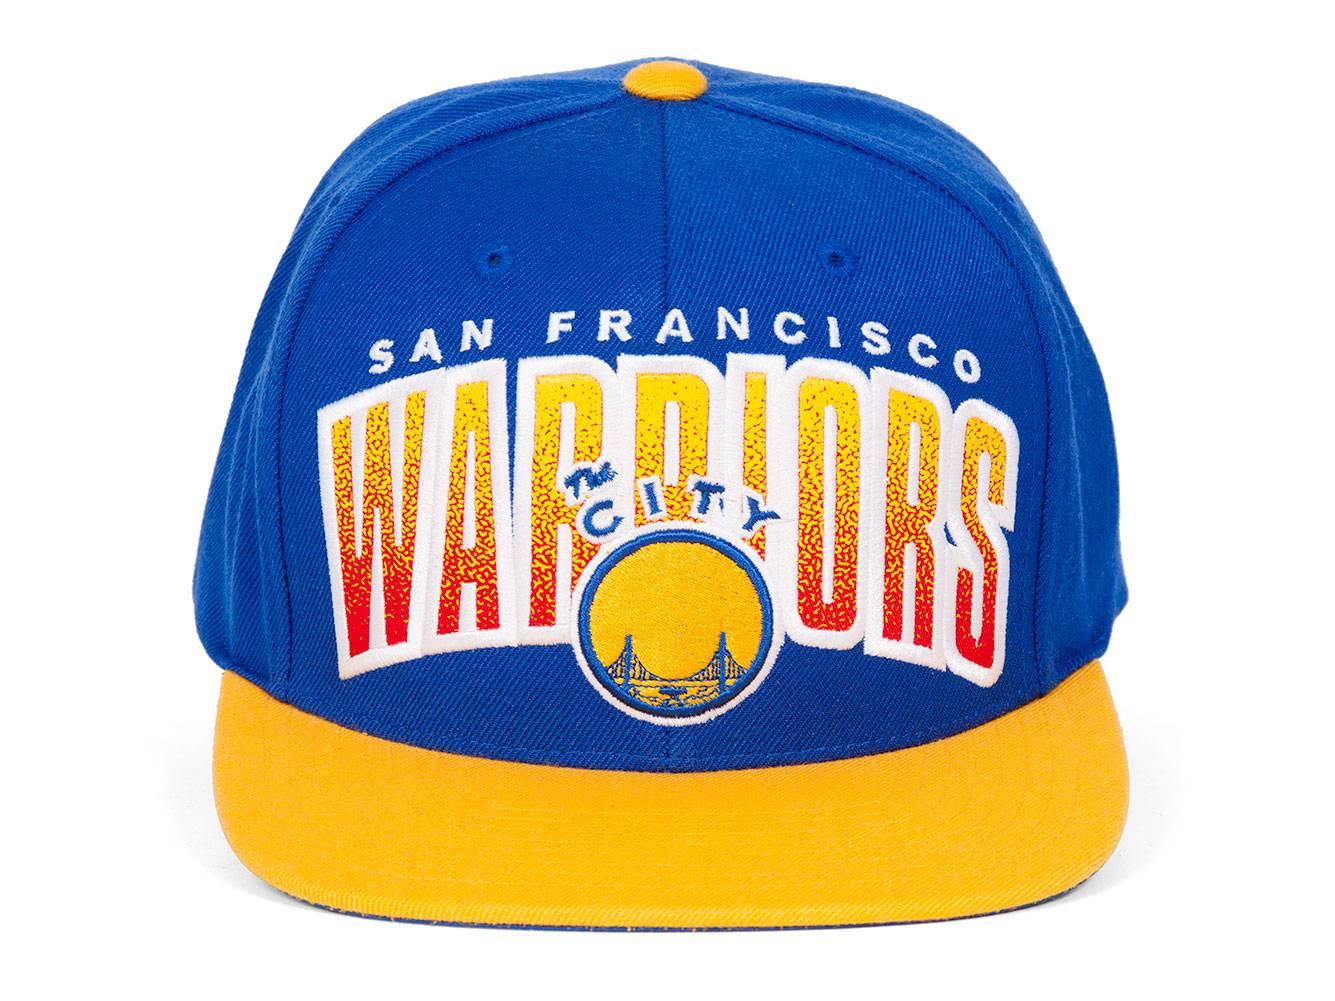 timeless design a80eb 6e885 Mitchell   Ness Golden State Warriors Double Bonus Snapback